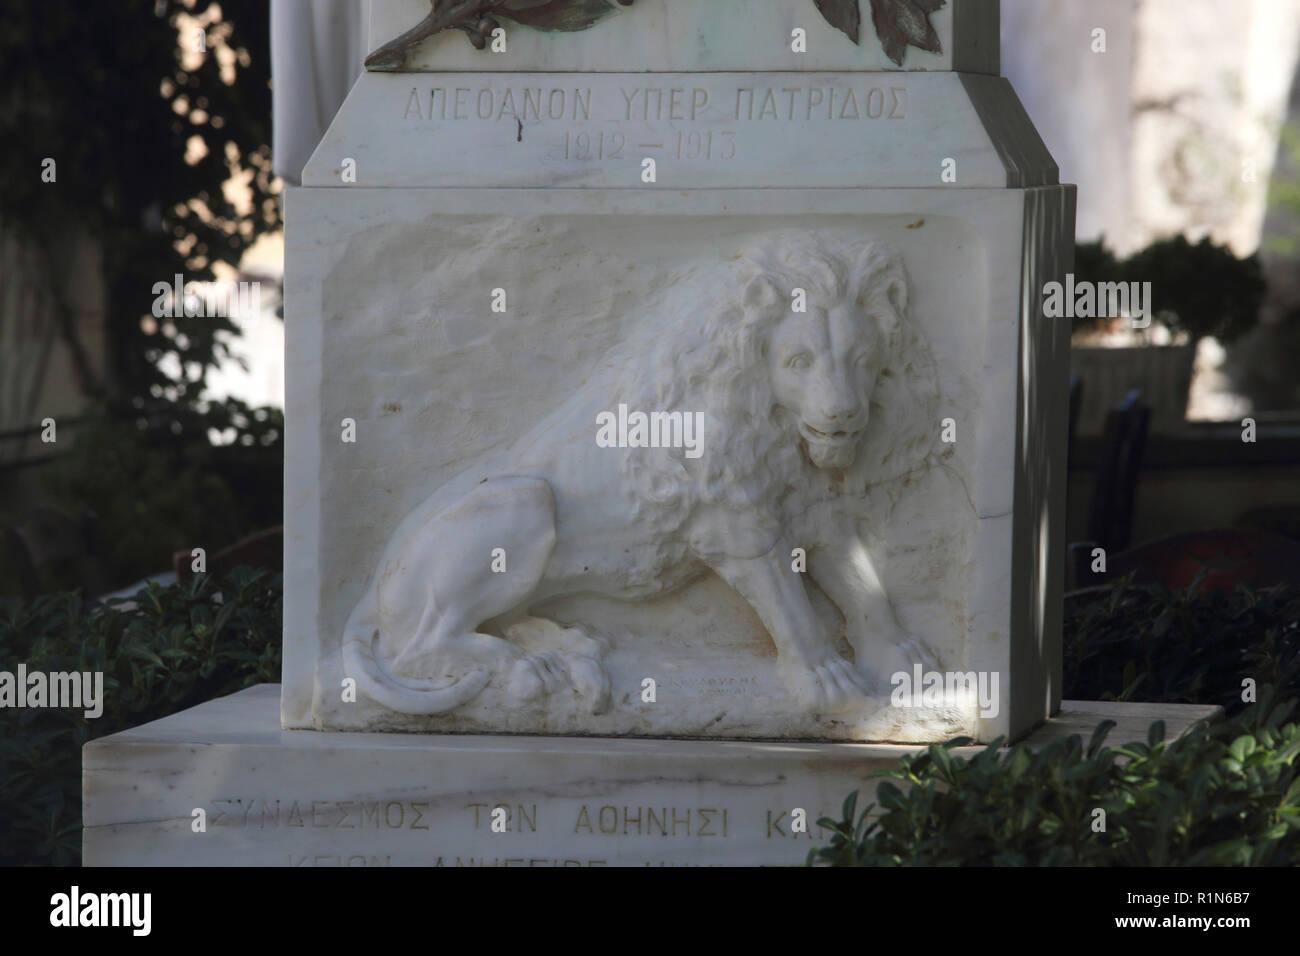 Kea Island Greece Ioulidha Monument to The First Balkan War 1912- 1913 - Stock Image